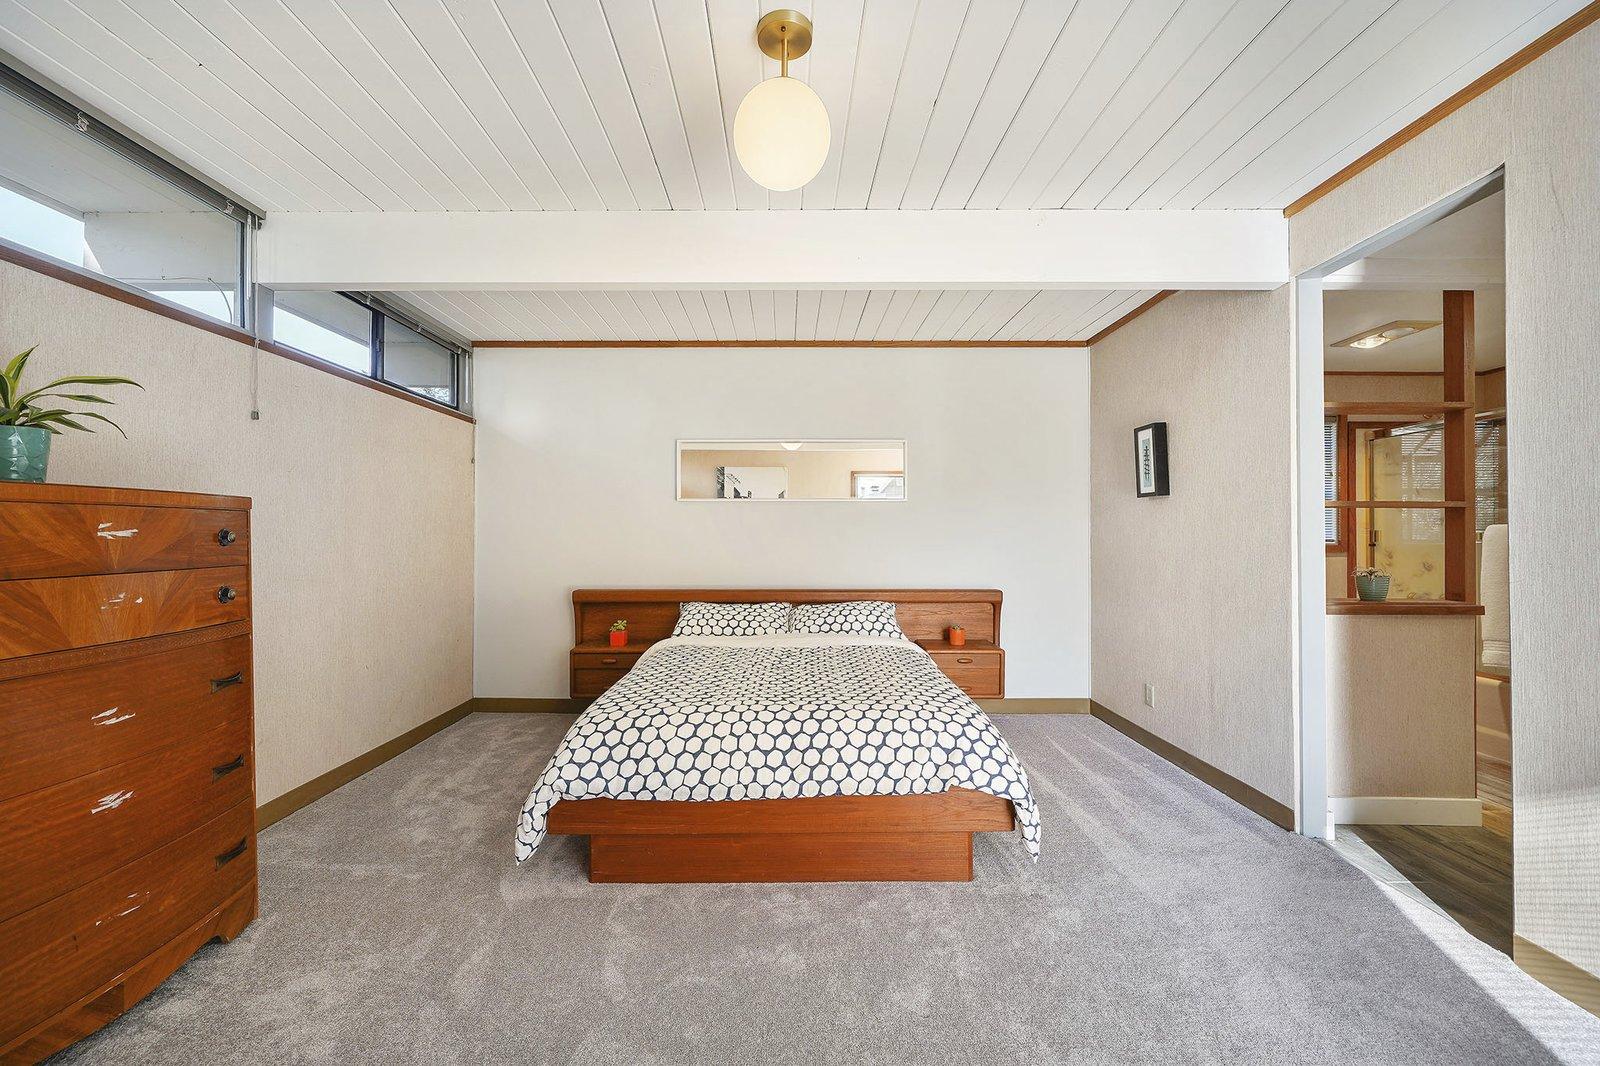 Castro Valley Eichler bedroom